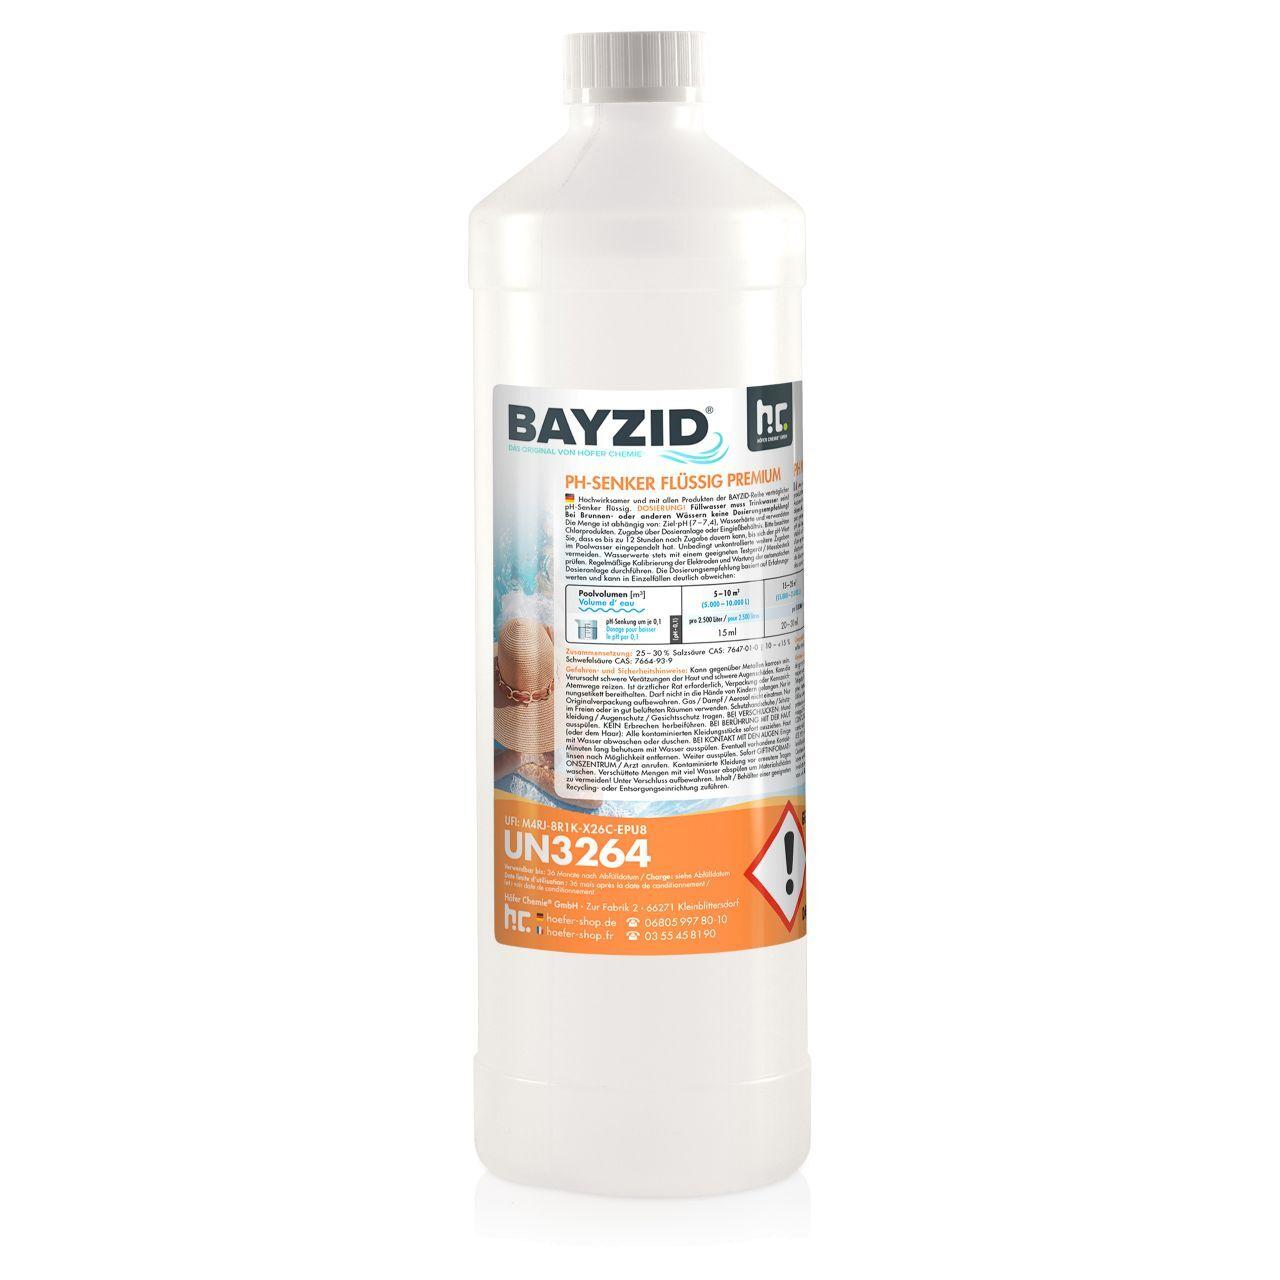 BAYZID 15 kg Bayzid® pH moins liquide (15 x 1 kg)